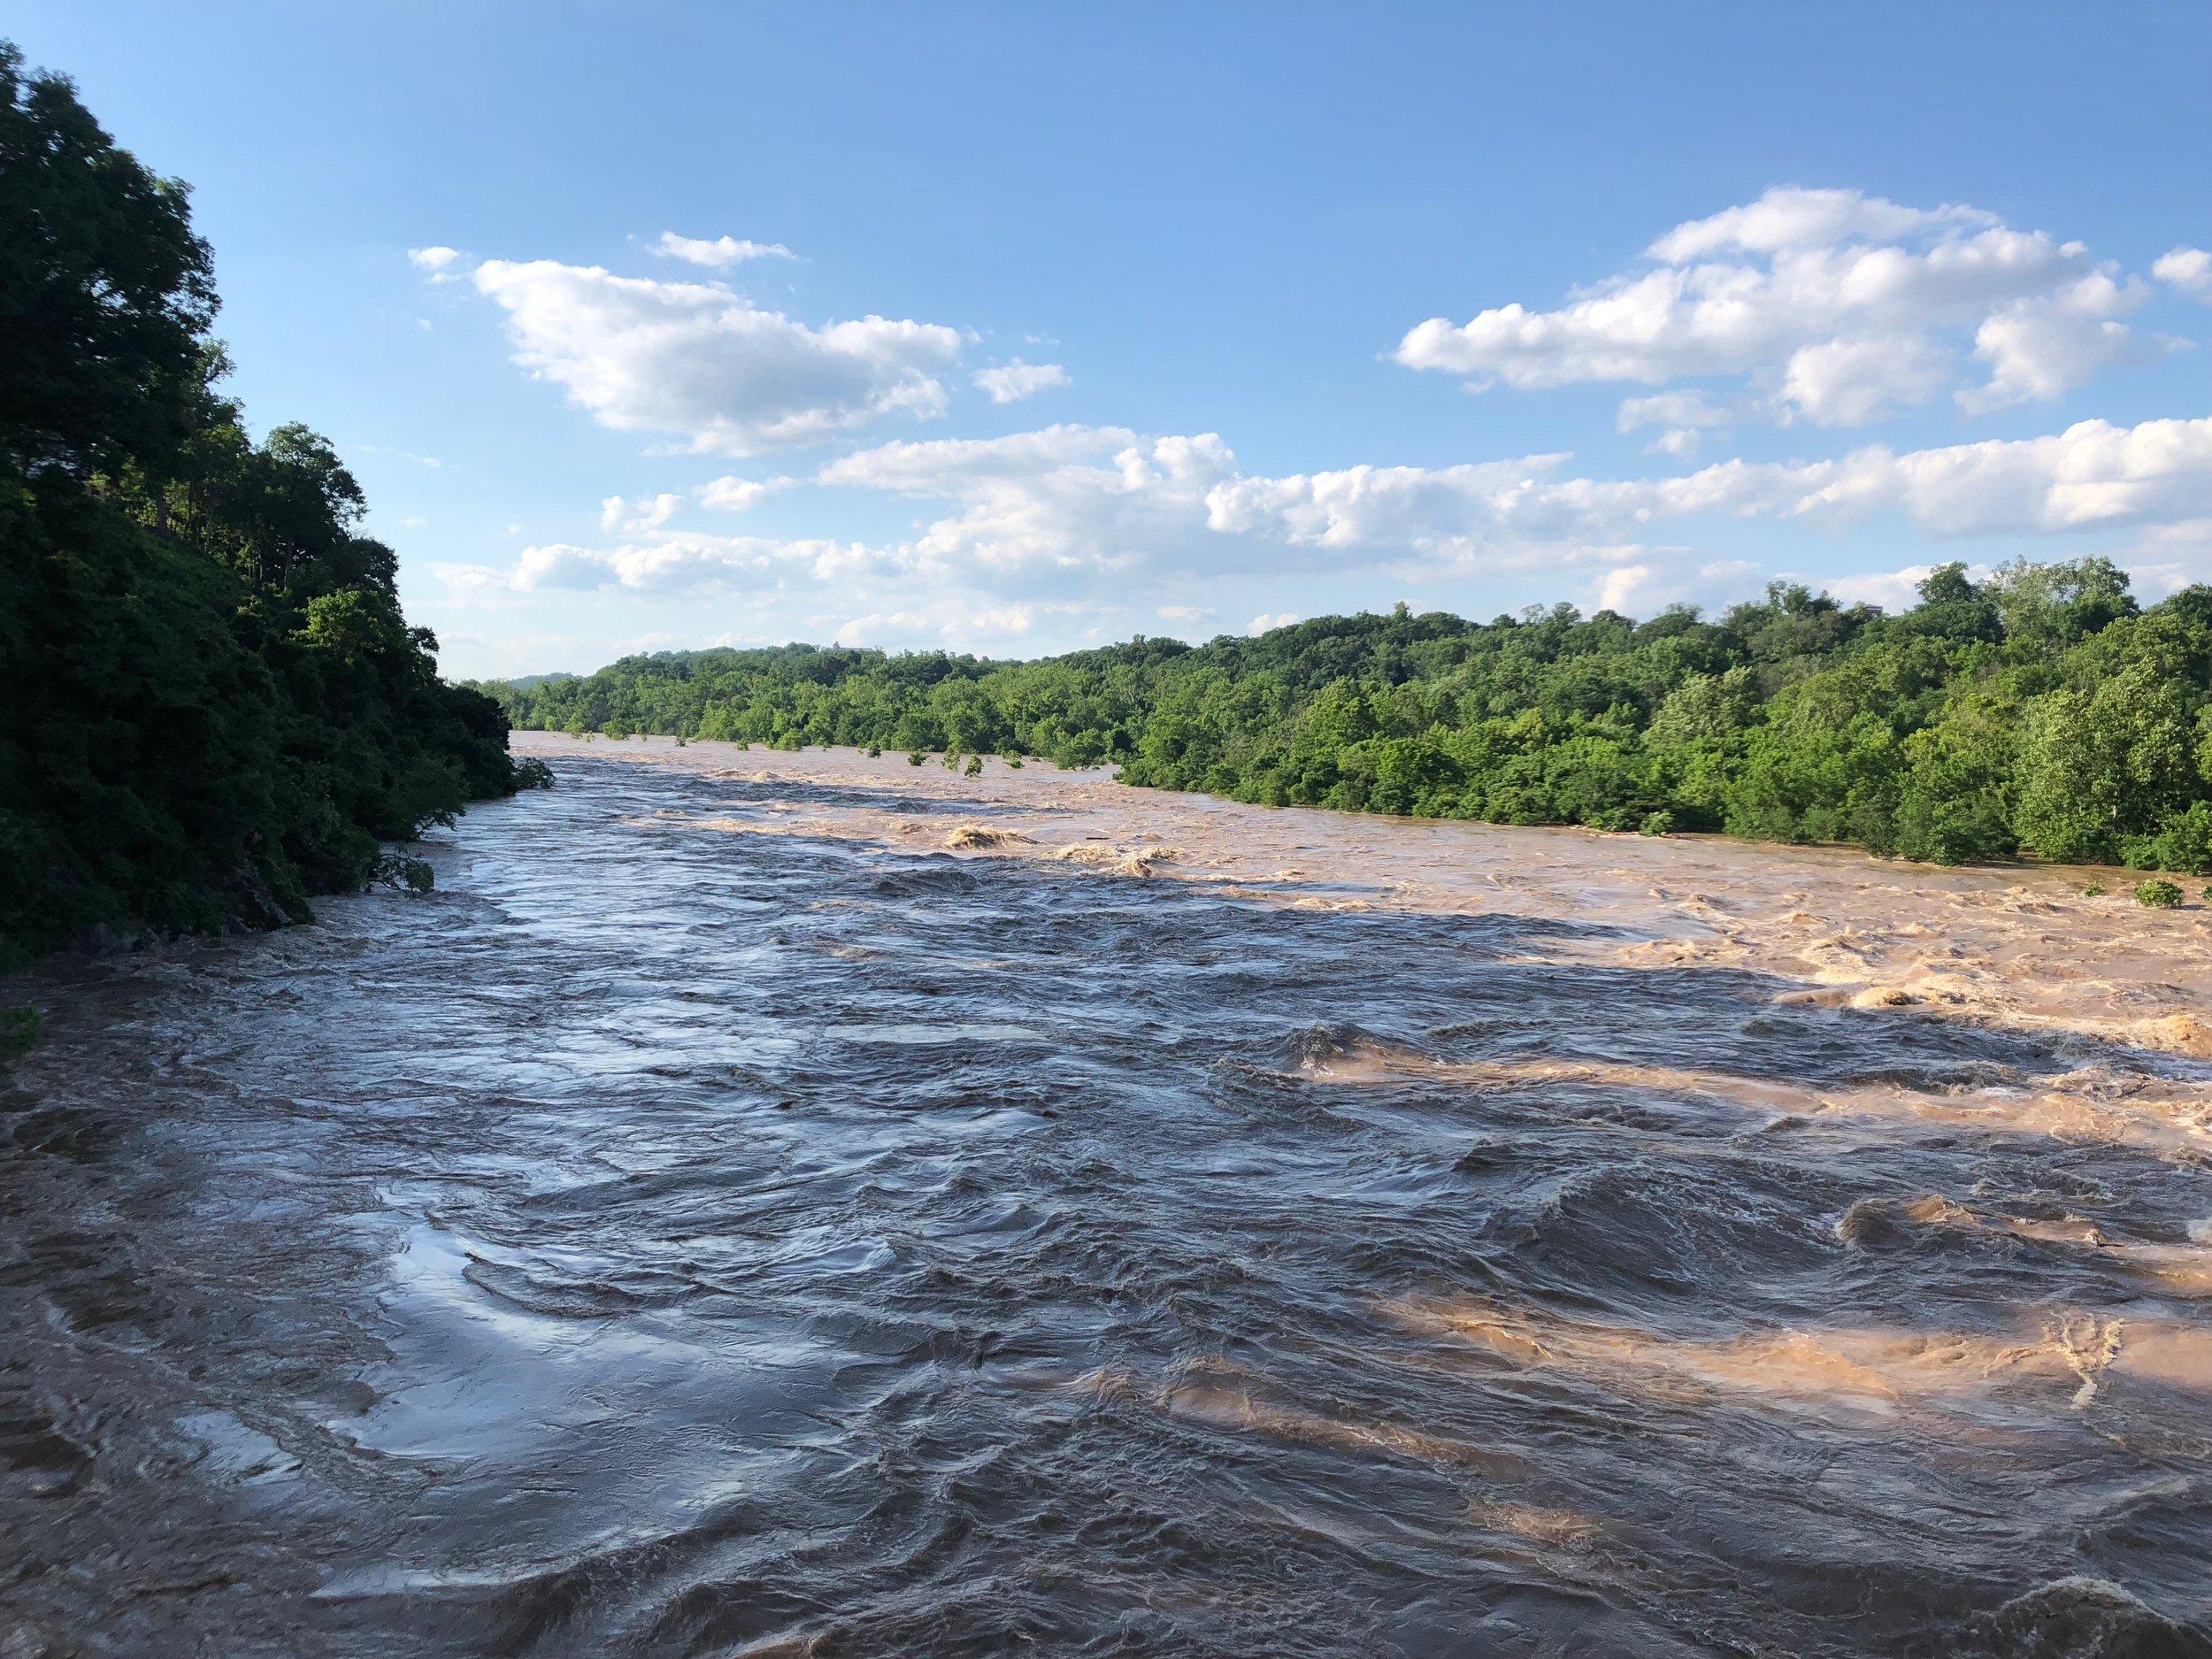 Upstream from Chain Bridge, June 4, 2018 | Alain, McLean, VA